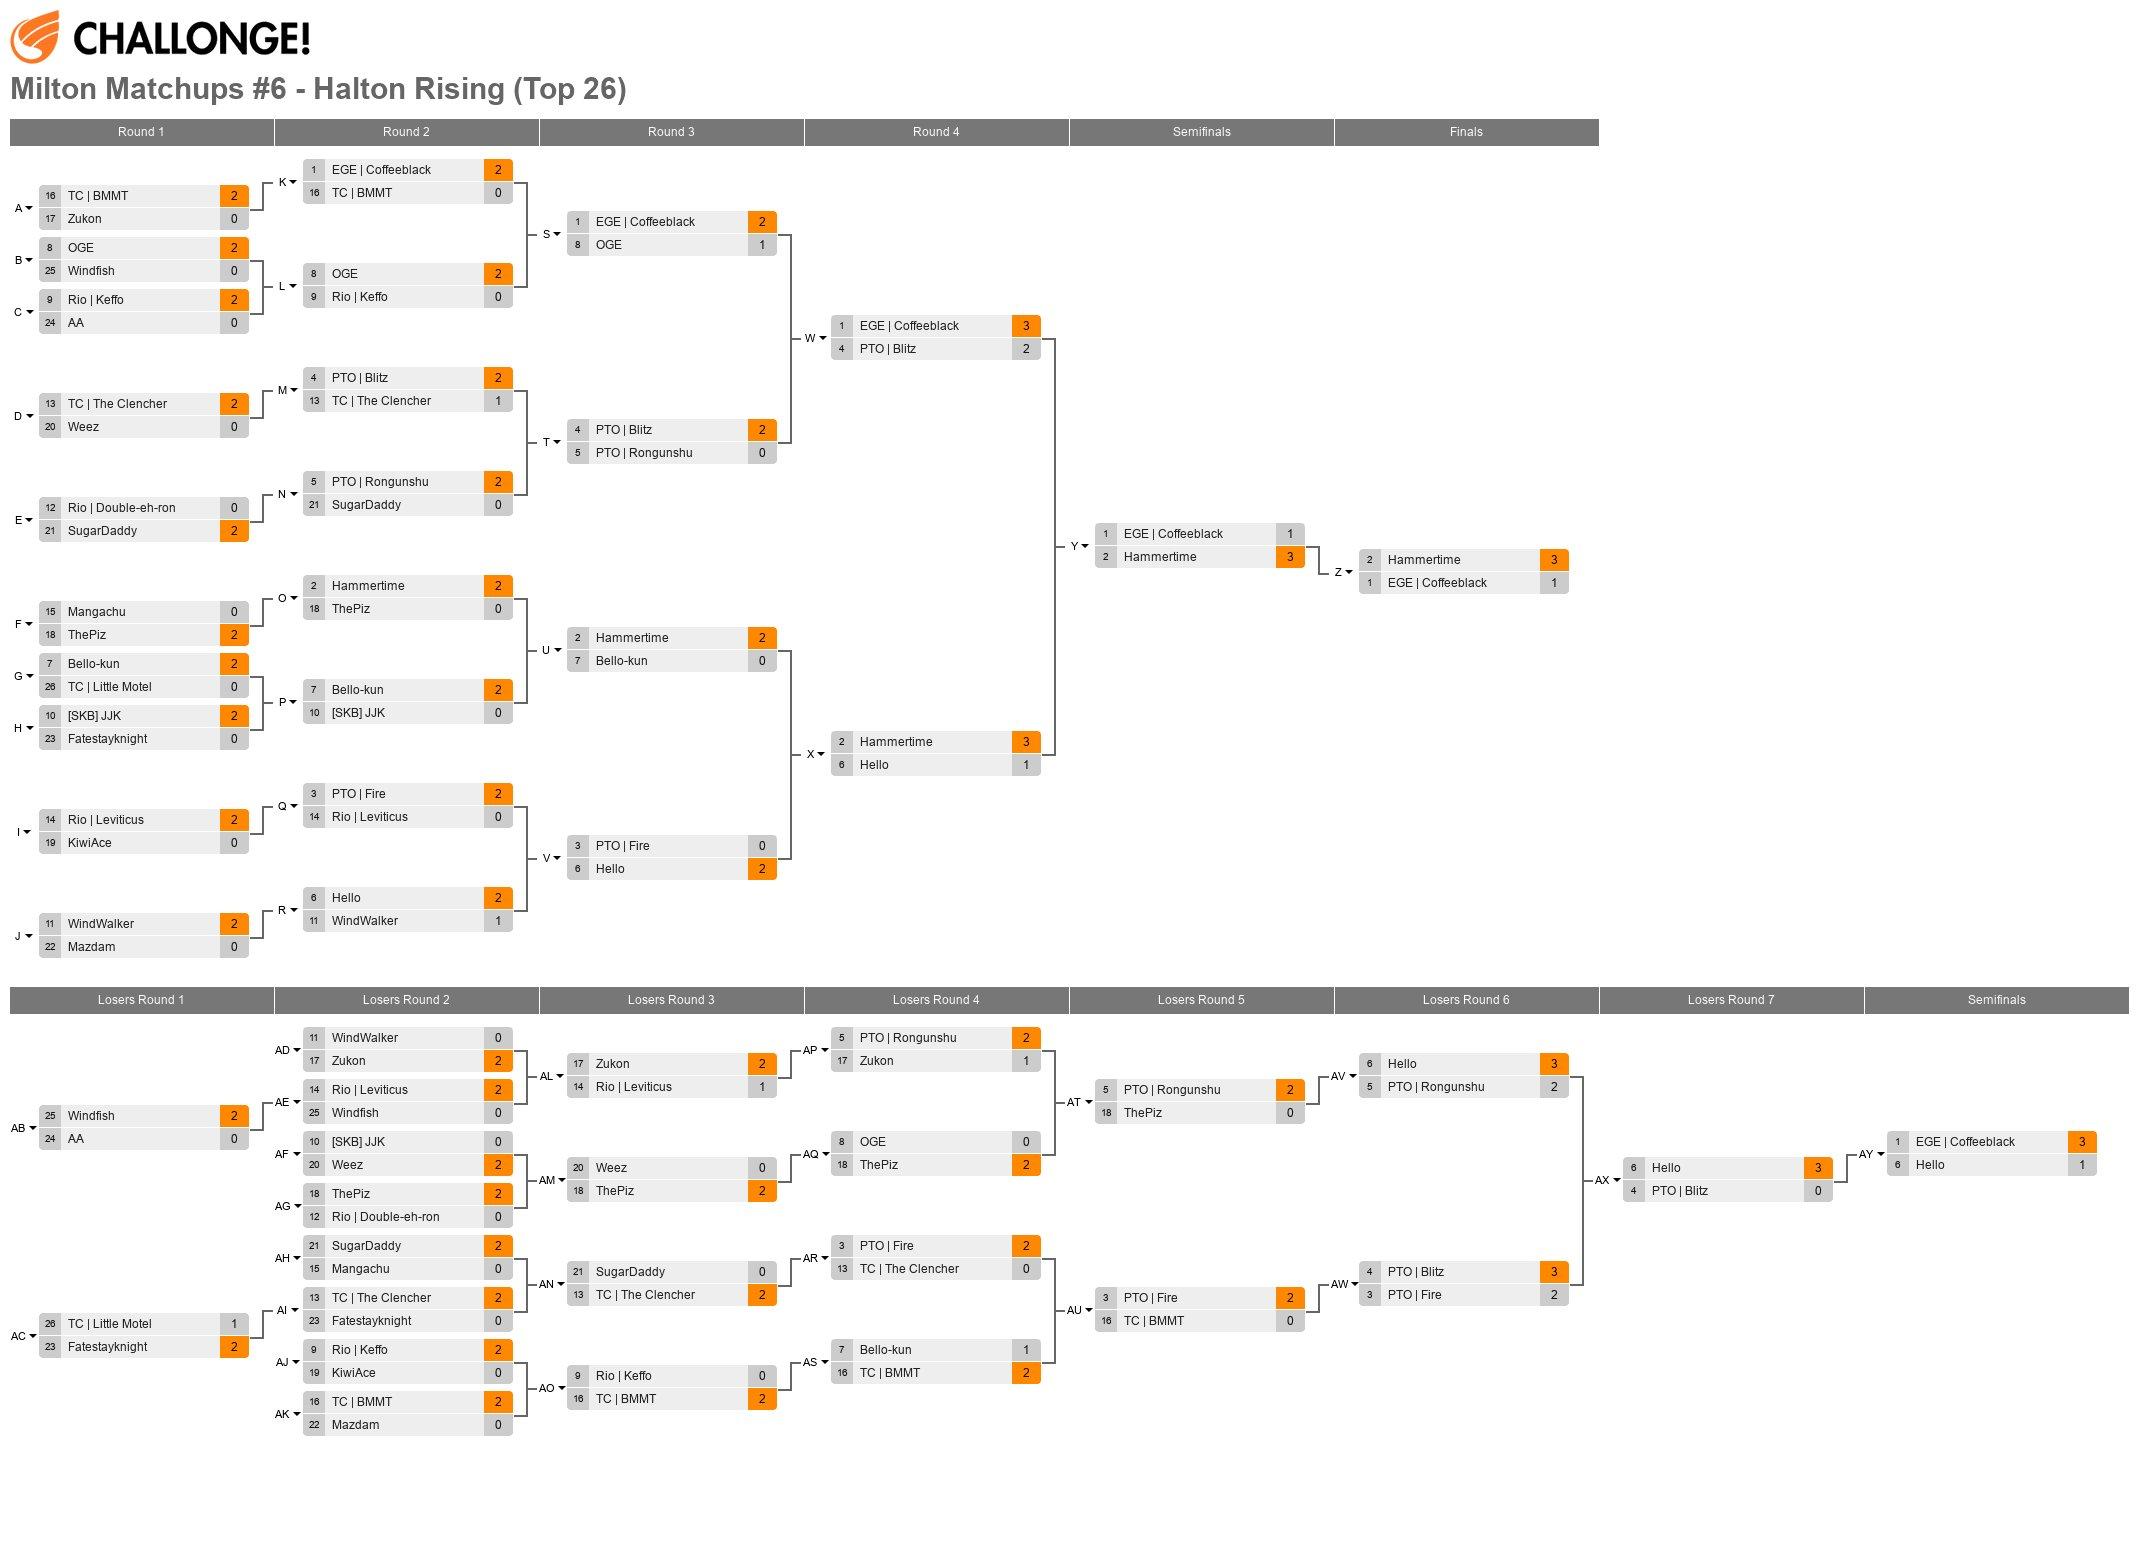 Milton Matchups #6 - Halton Rising  - Top 26 Bracket [38 Entrants]